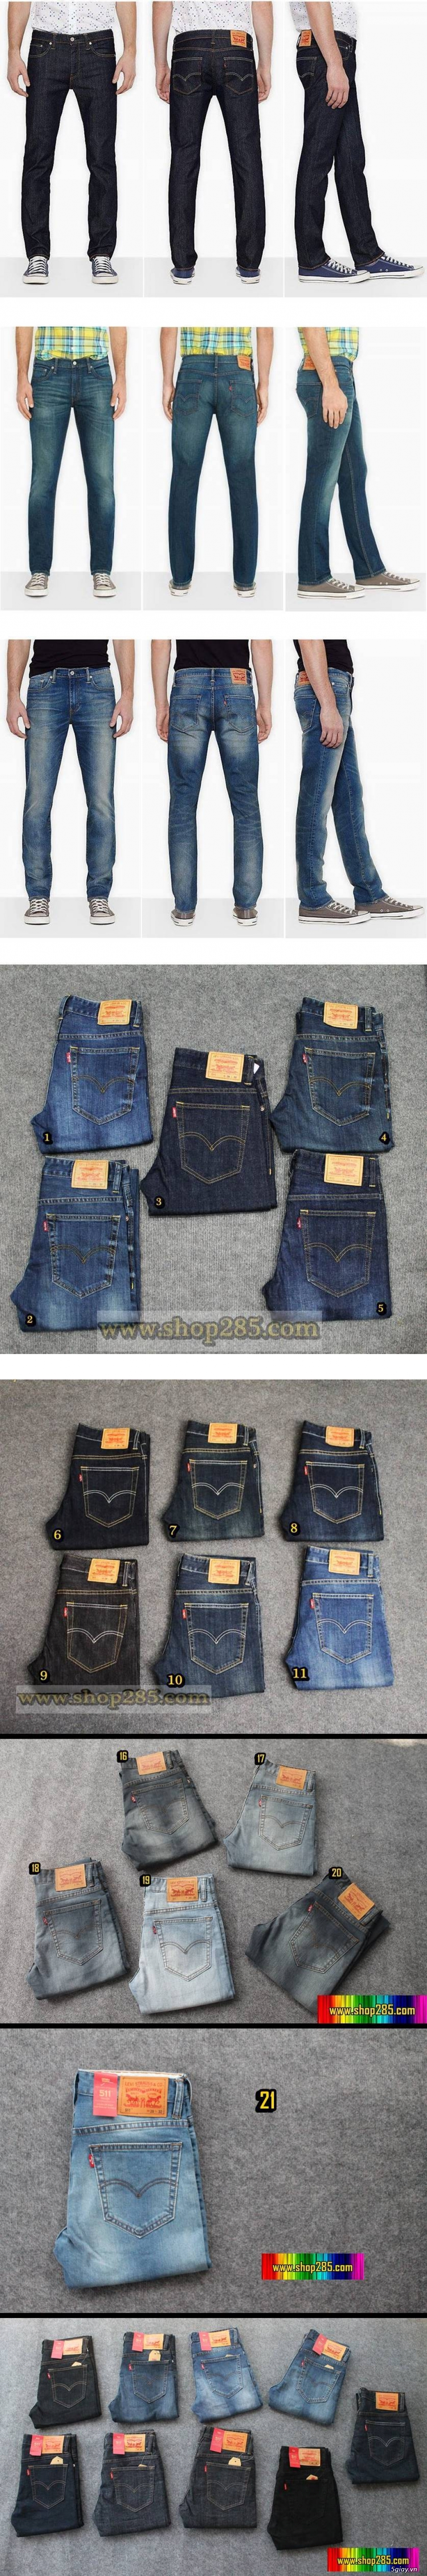 Shop285.com - Shop quần áo : Zara,Jules,Jake*s,,Hollister,Aber,CK,Tommy,Levis - 38